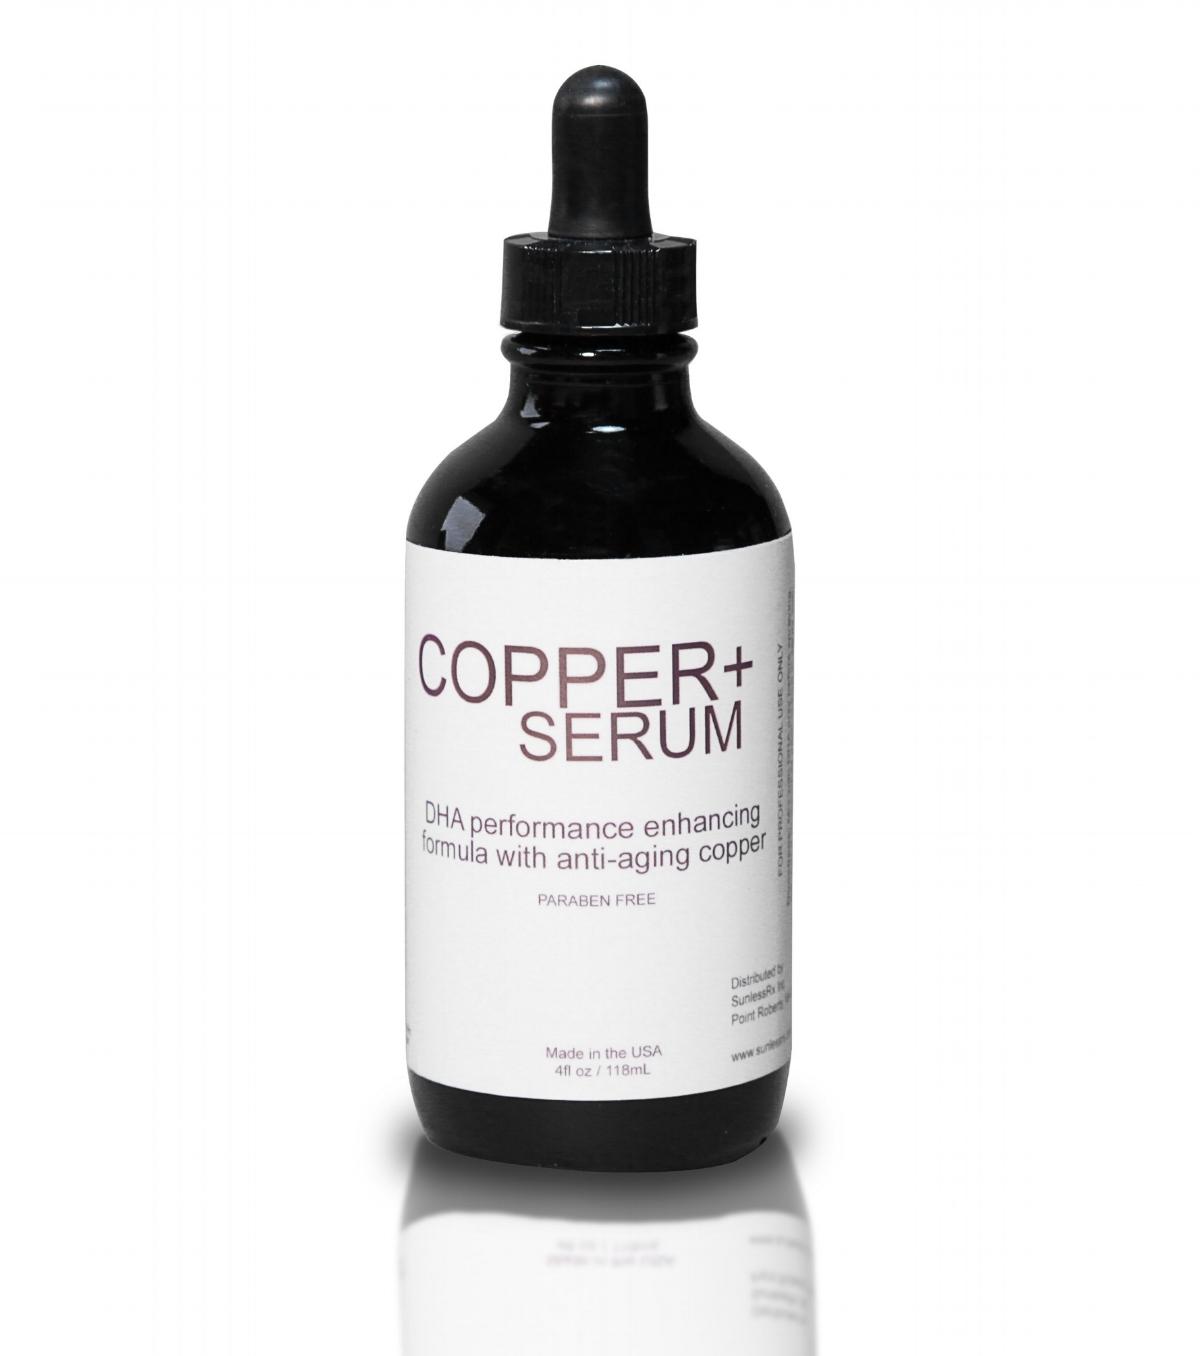 COPPER+SERUM - the professional secret